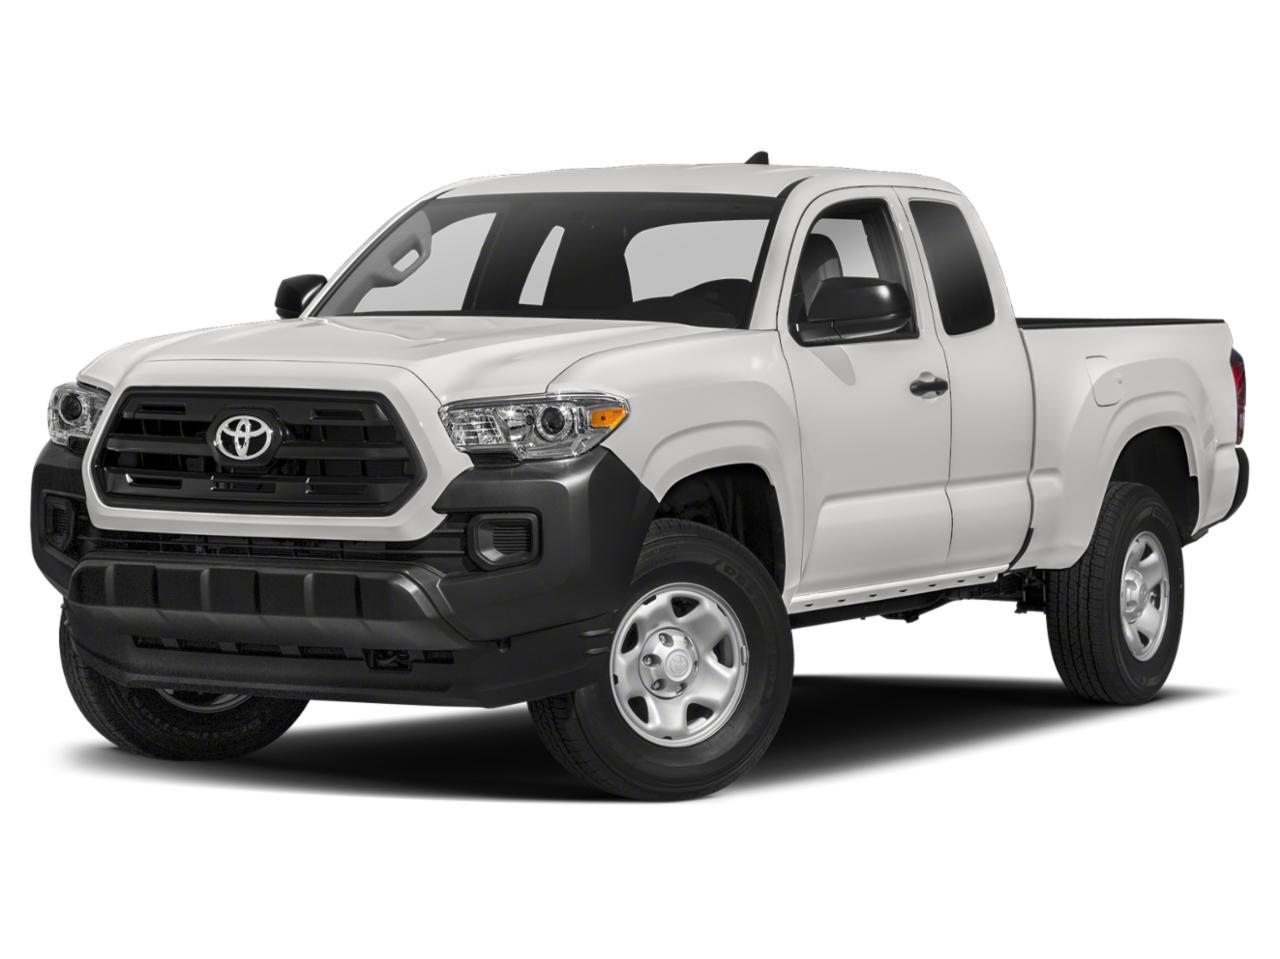 2018 Toyota Tacoma Vehicle Photo in Flemington, NJ 08822